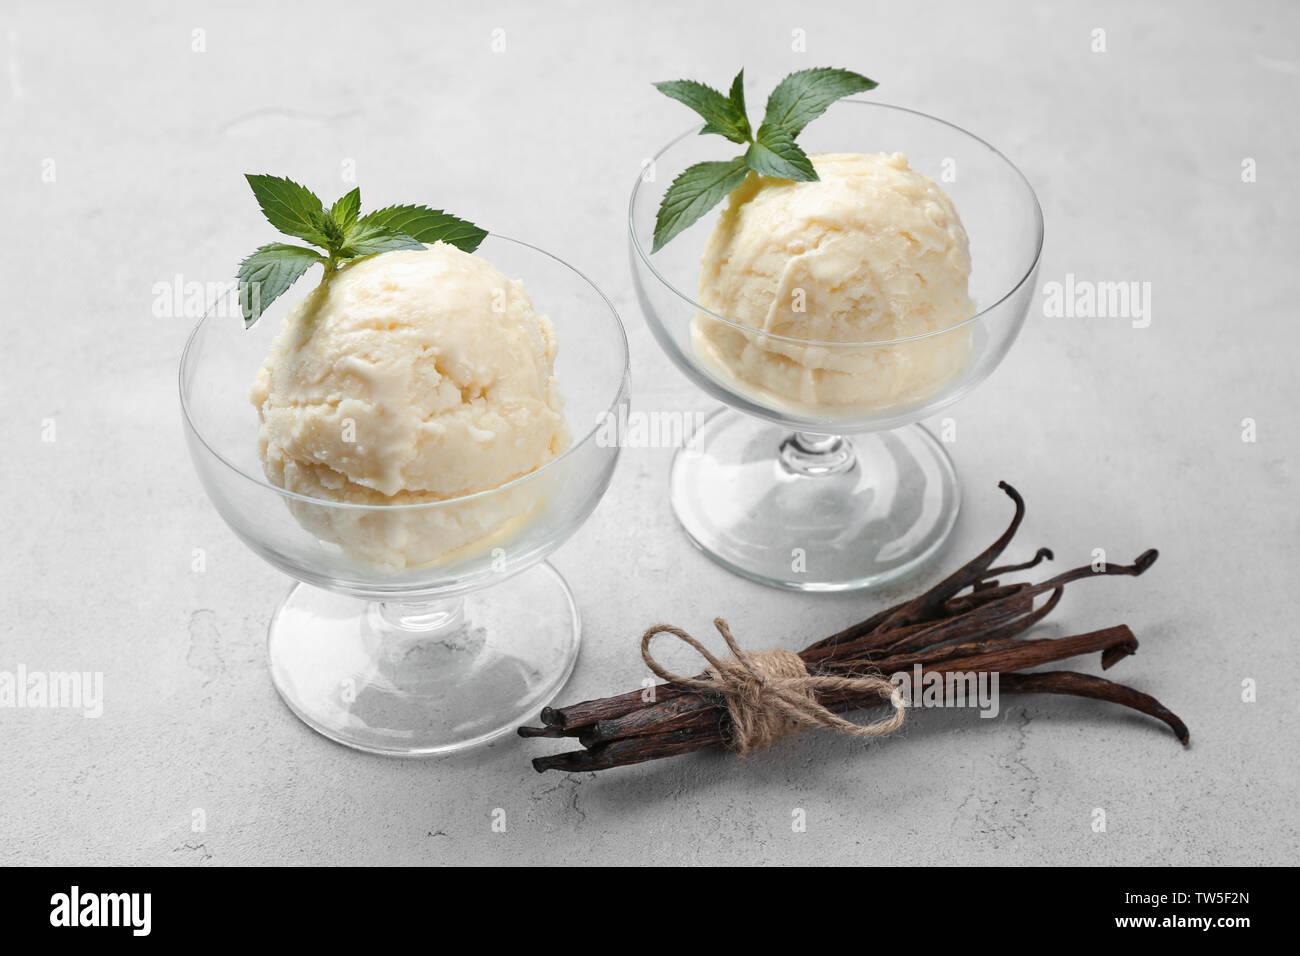 Delicious vanilla ice cream in glass dessert bowls on light background Stock Photo